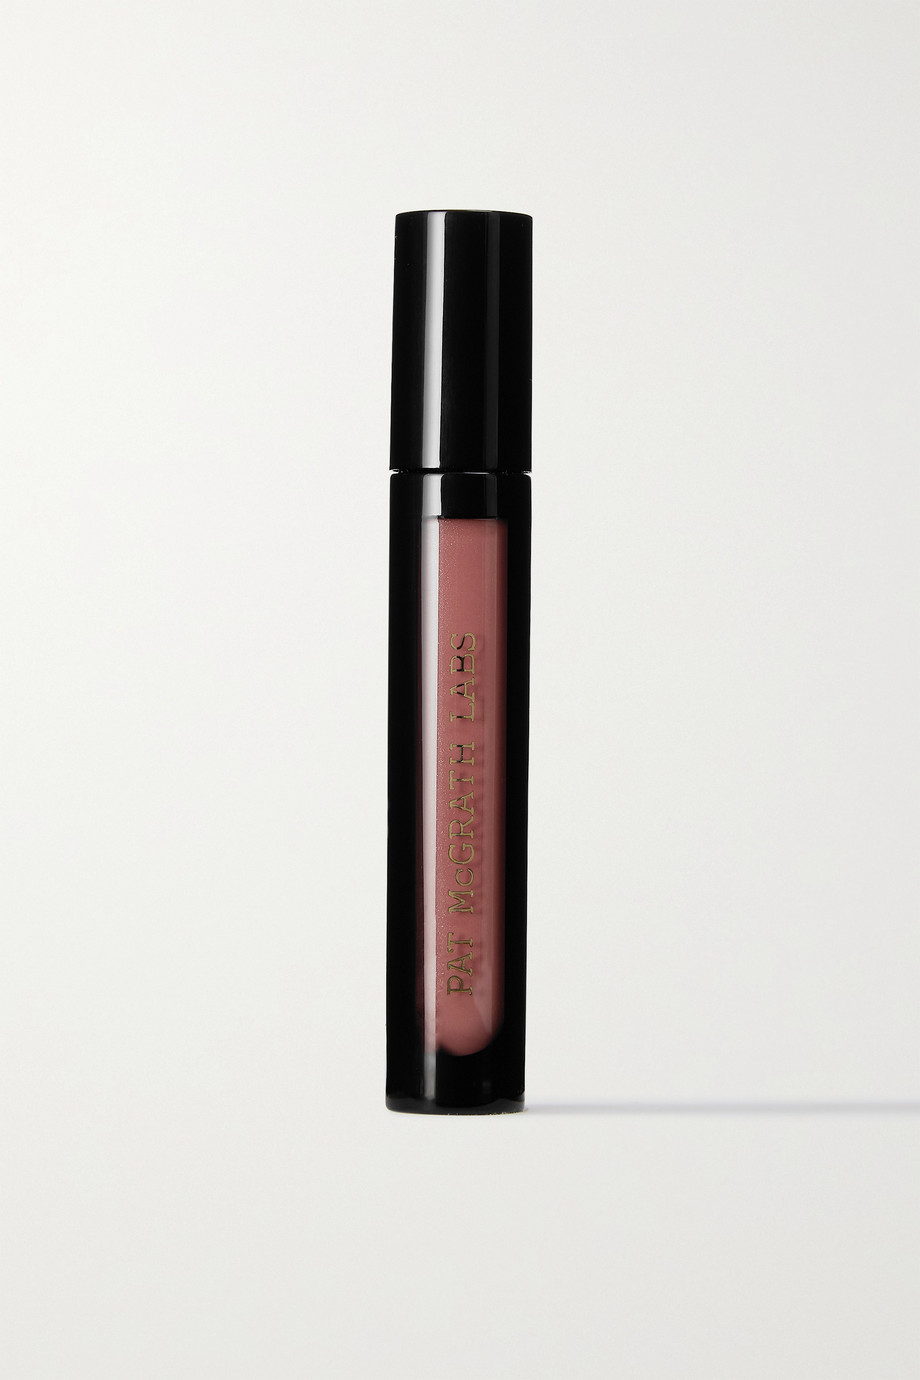 Pat McGrath Labs LiquiLUST: Legendary Wear Matte Lipstick - Divine Nude